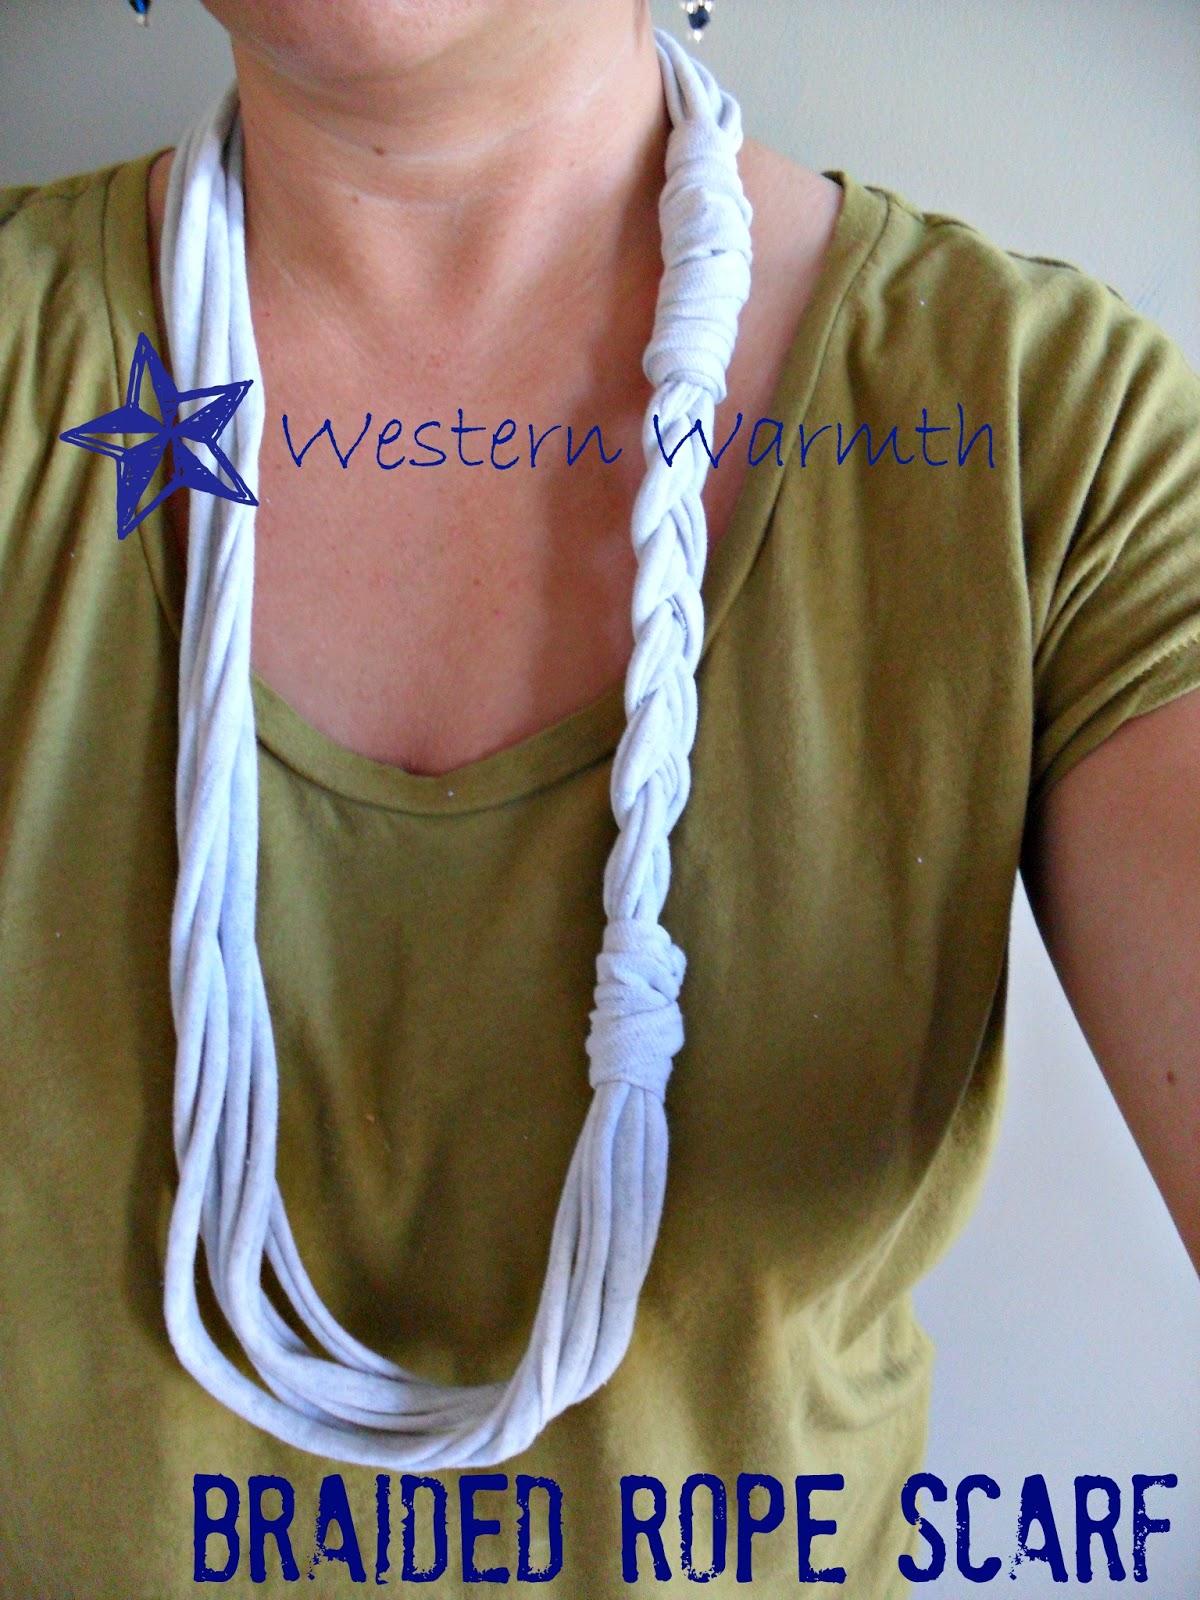 western warmth t shirt scarf